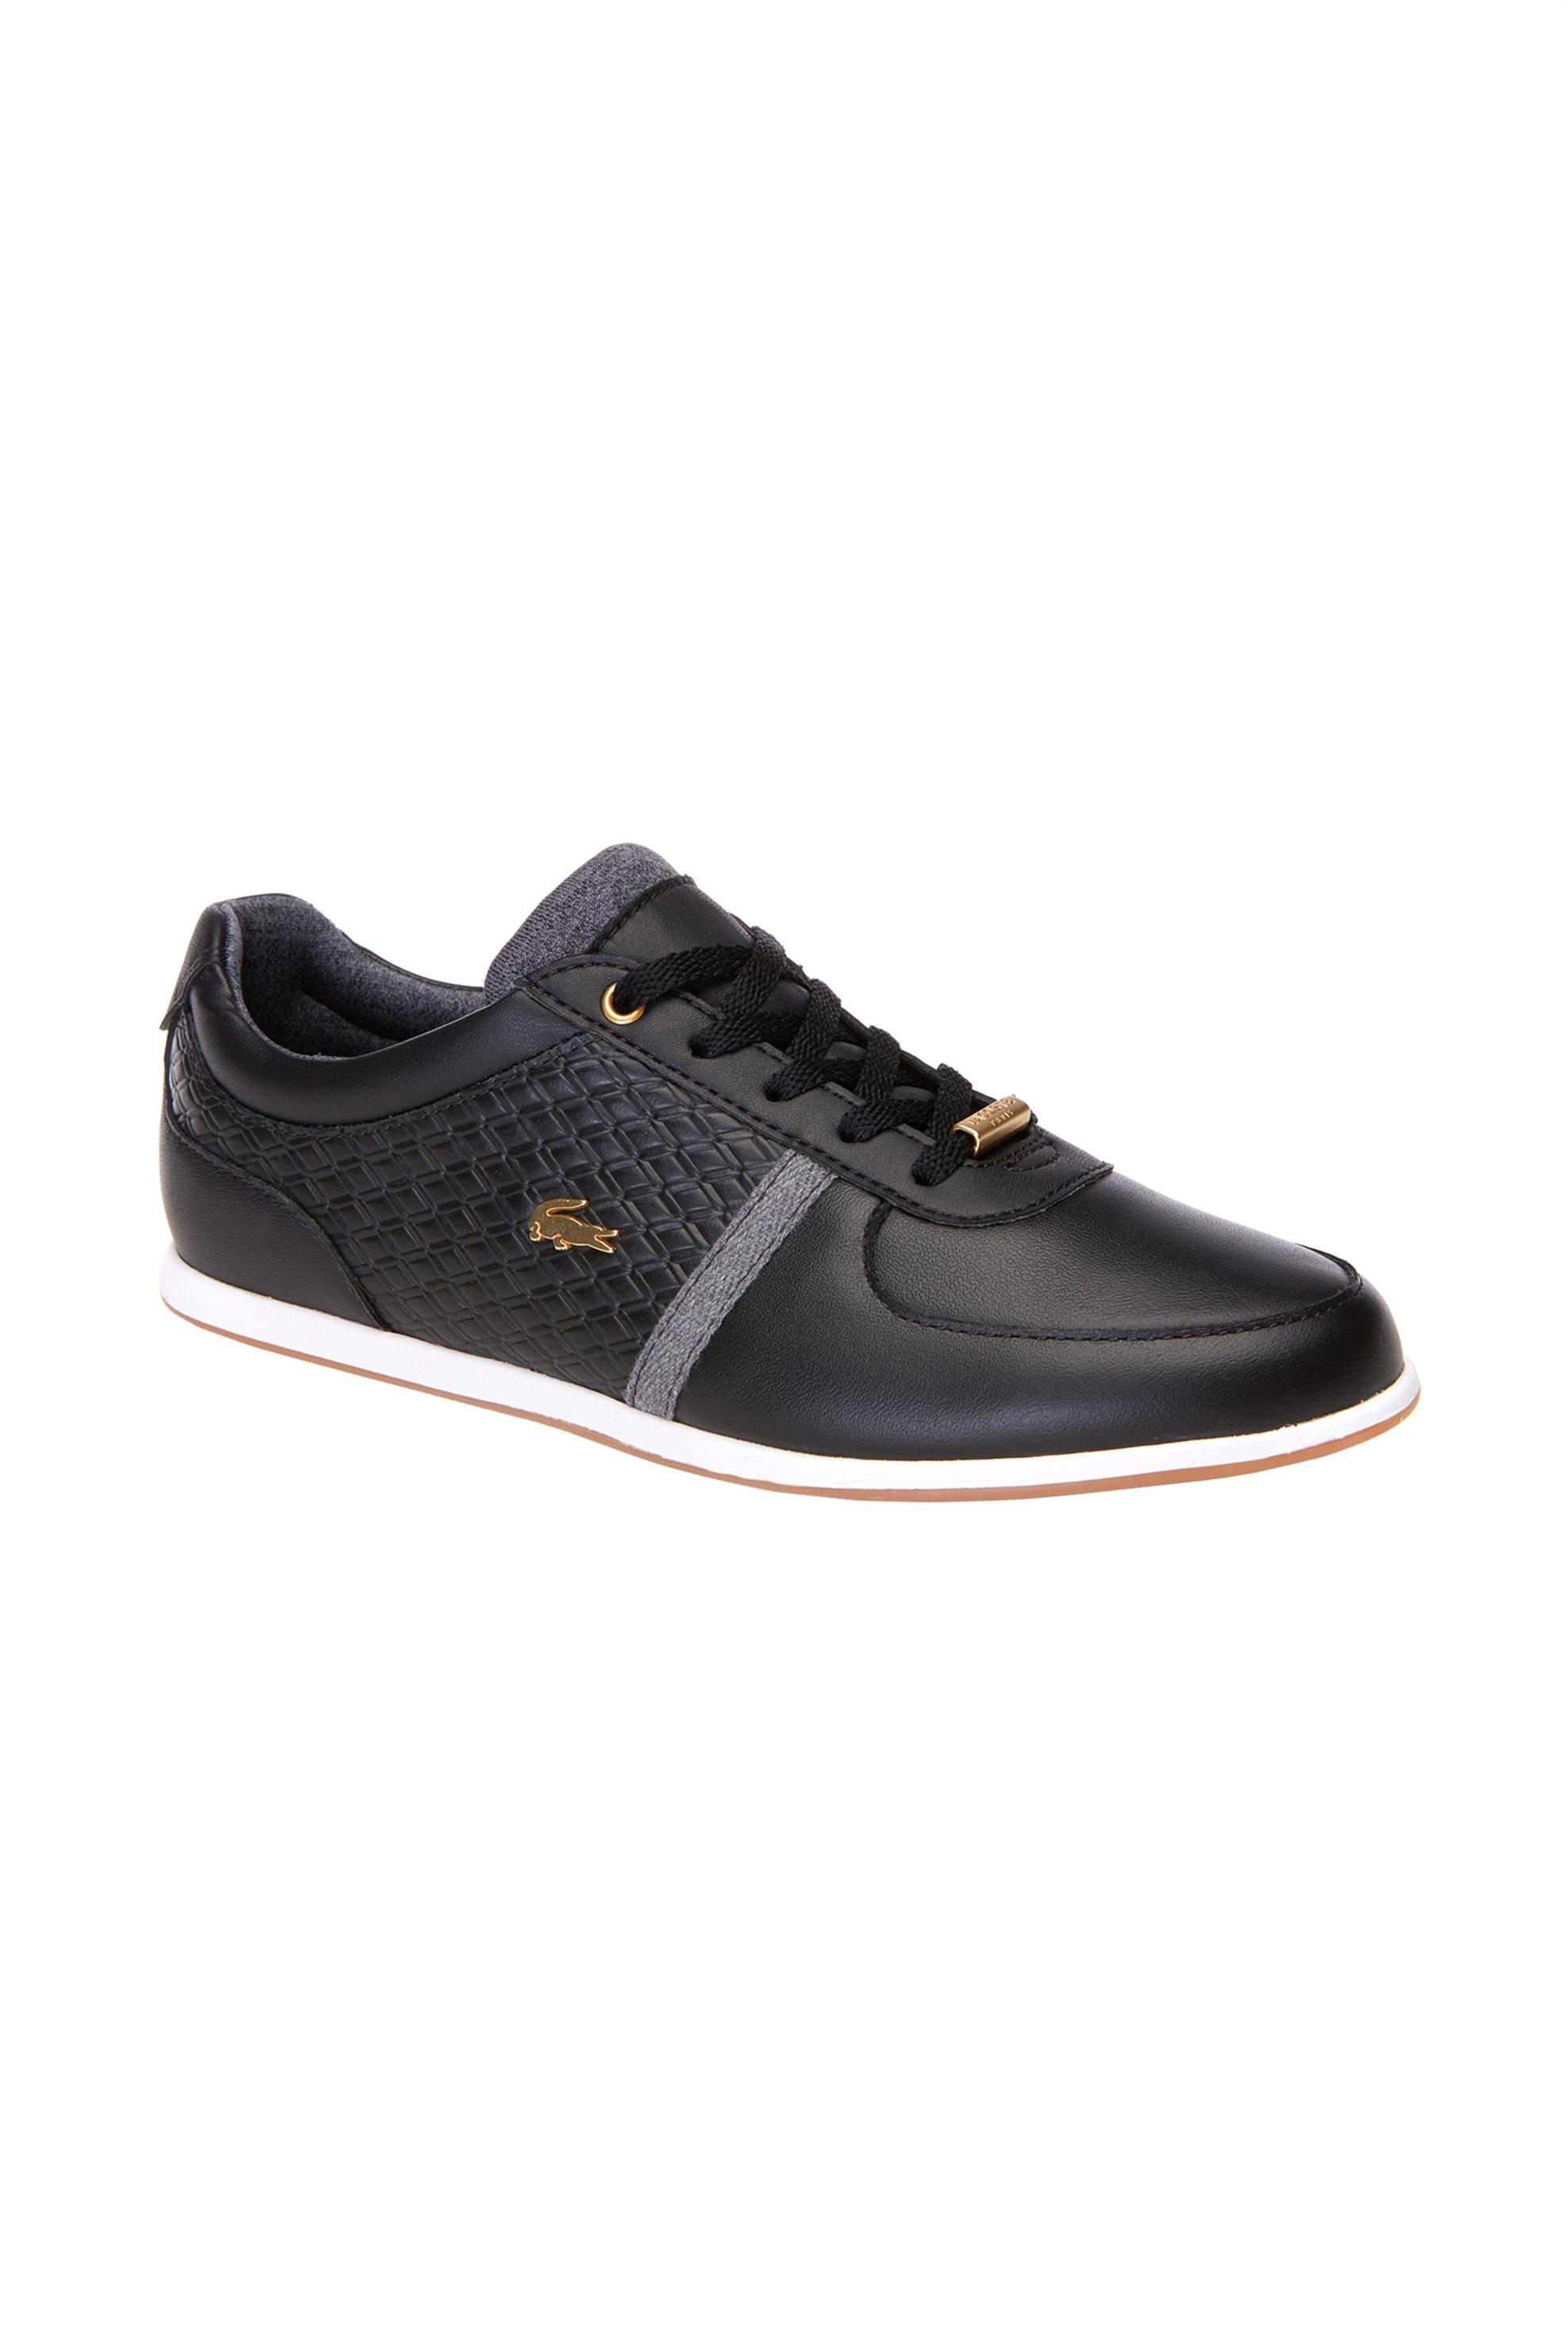 094525c8cc1 -30% Notos Lacoste γυναικεία δερμάτινα παπούτσια με κορδόνια Rey Sport –  36CAW0034237 – Μαύρο